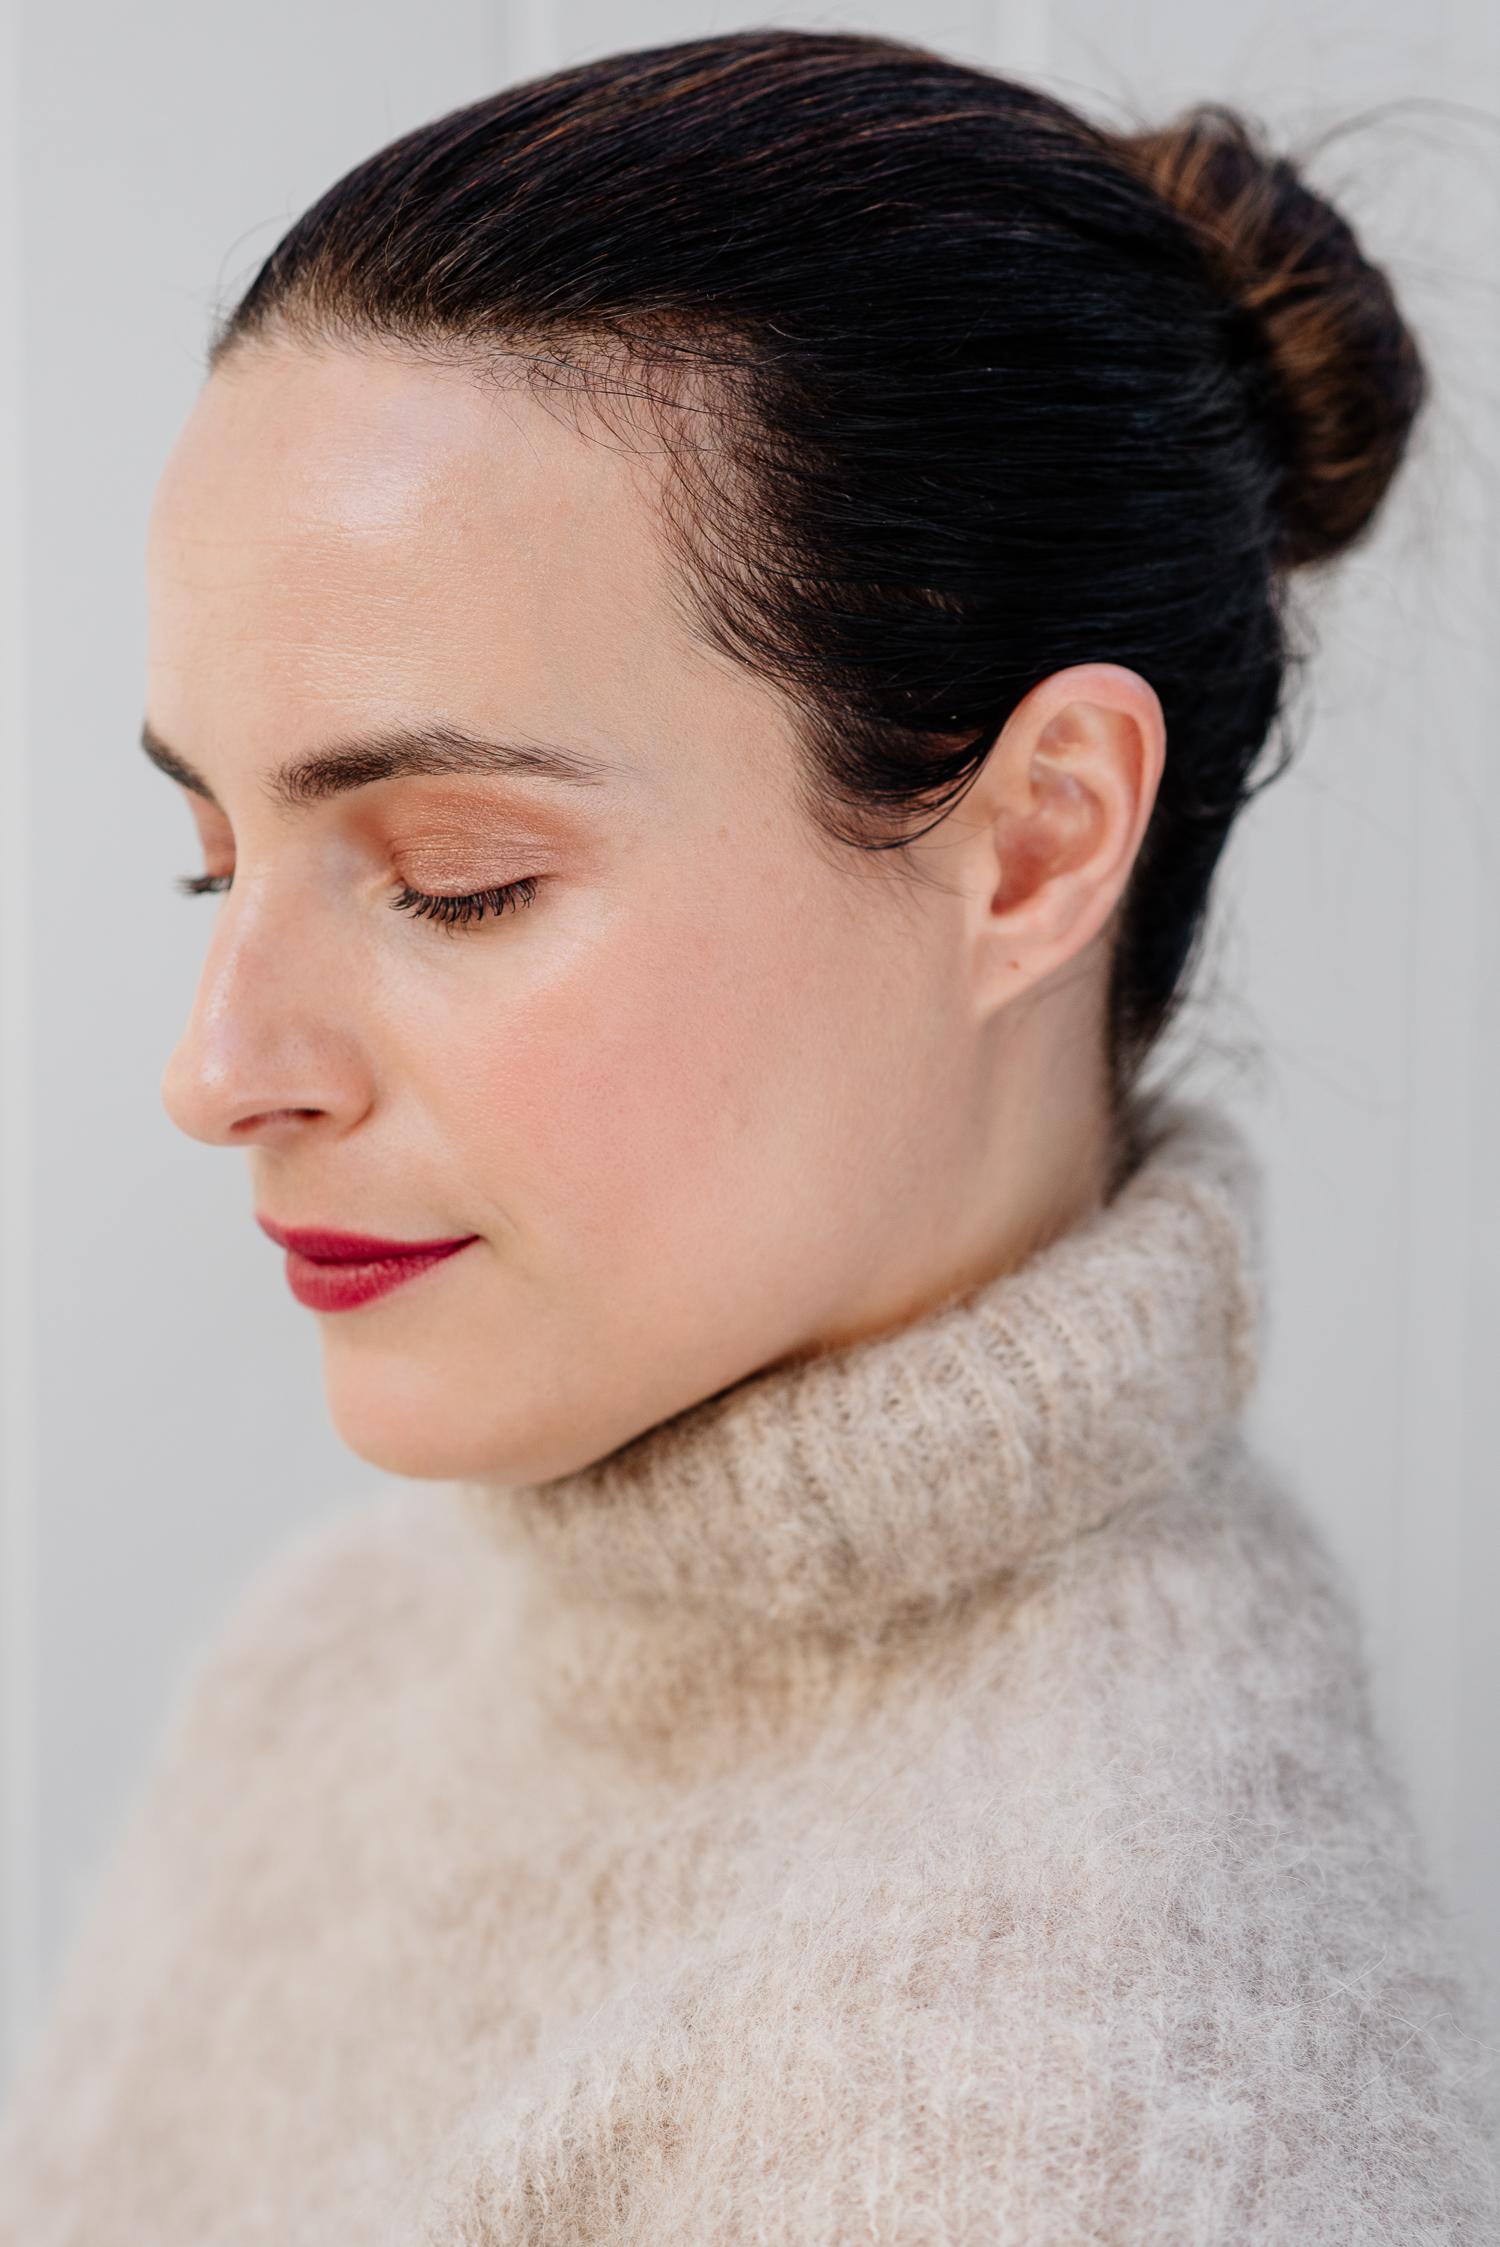 organic make up berry lipstick copper eye shadow .jpg